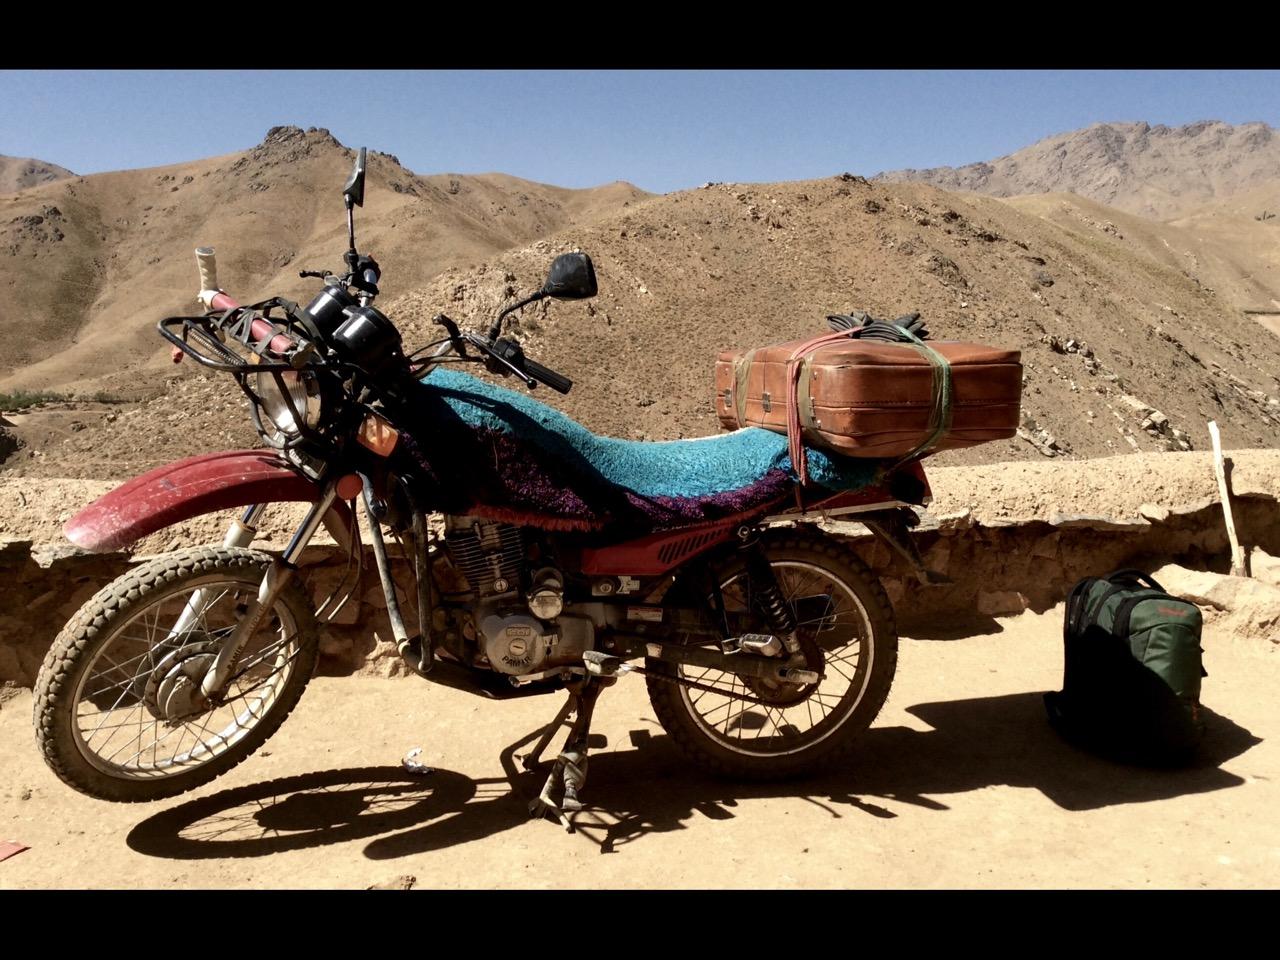 Motorcycle with BORDERLINE equipment